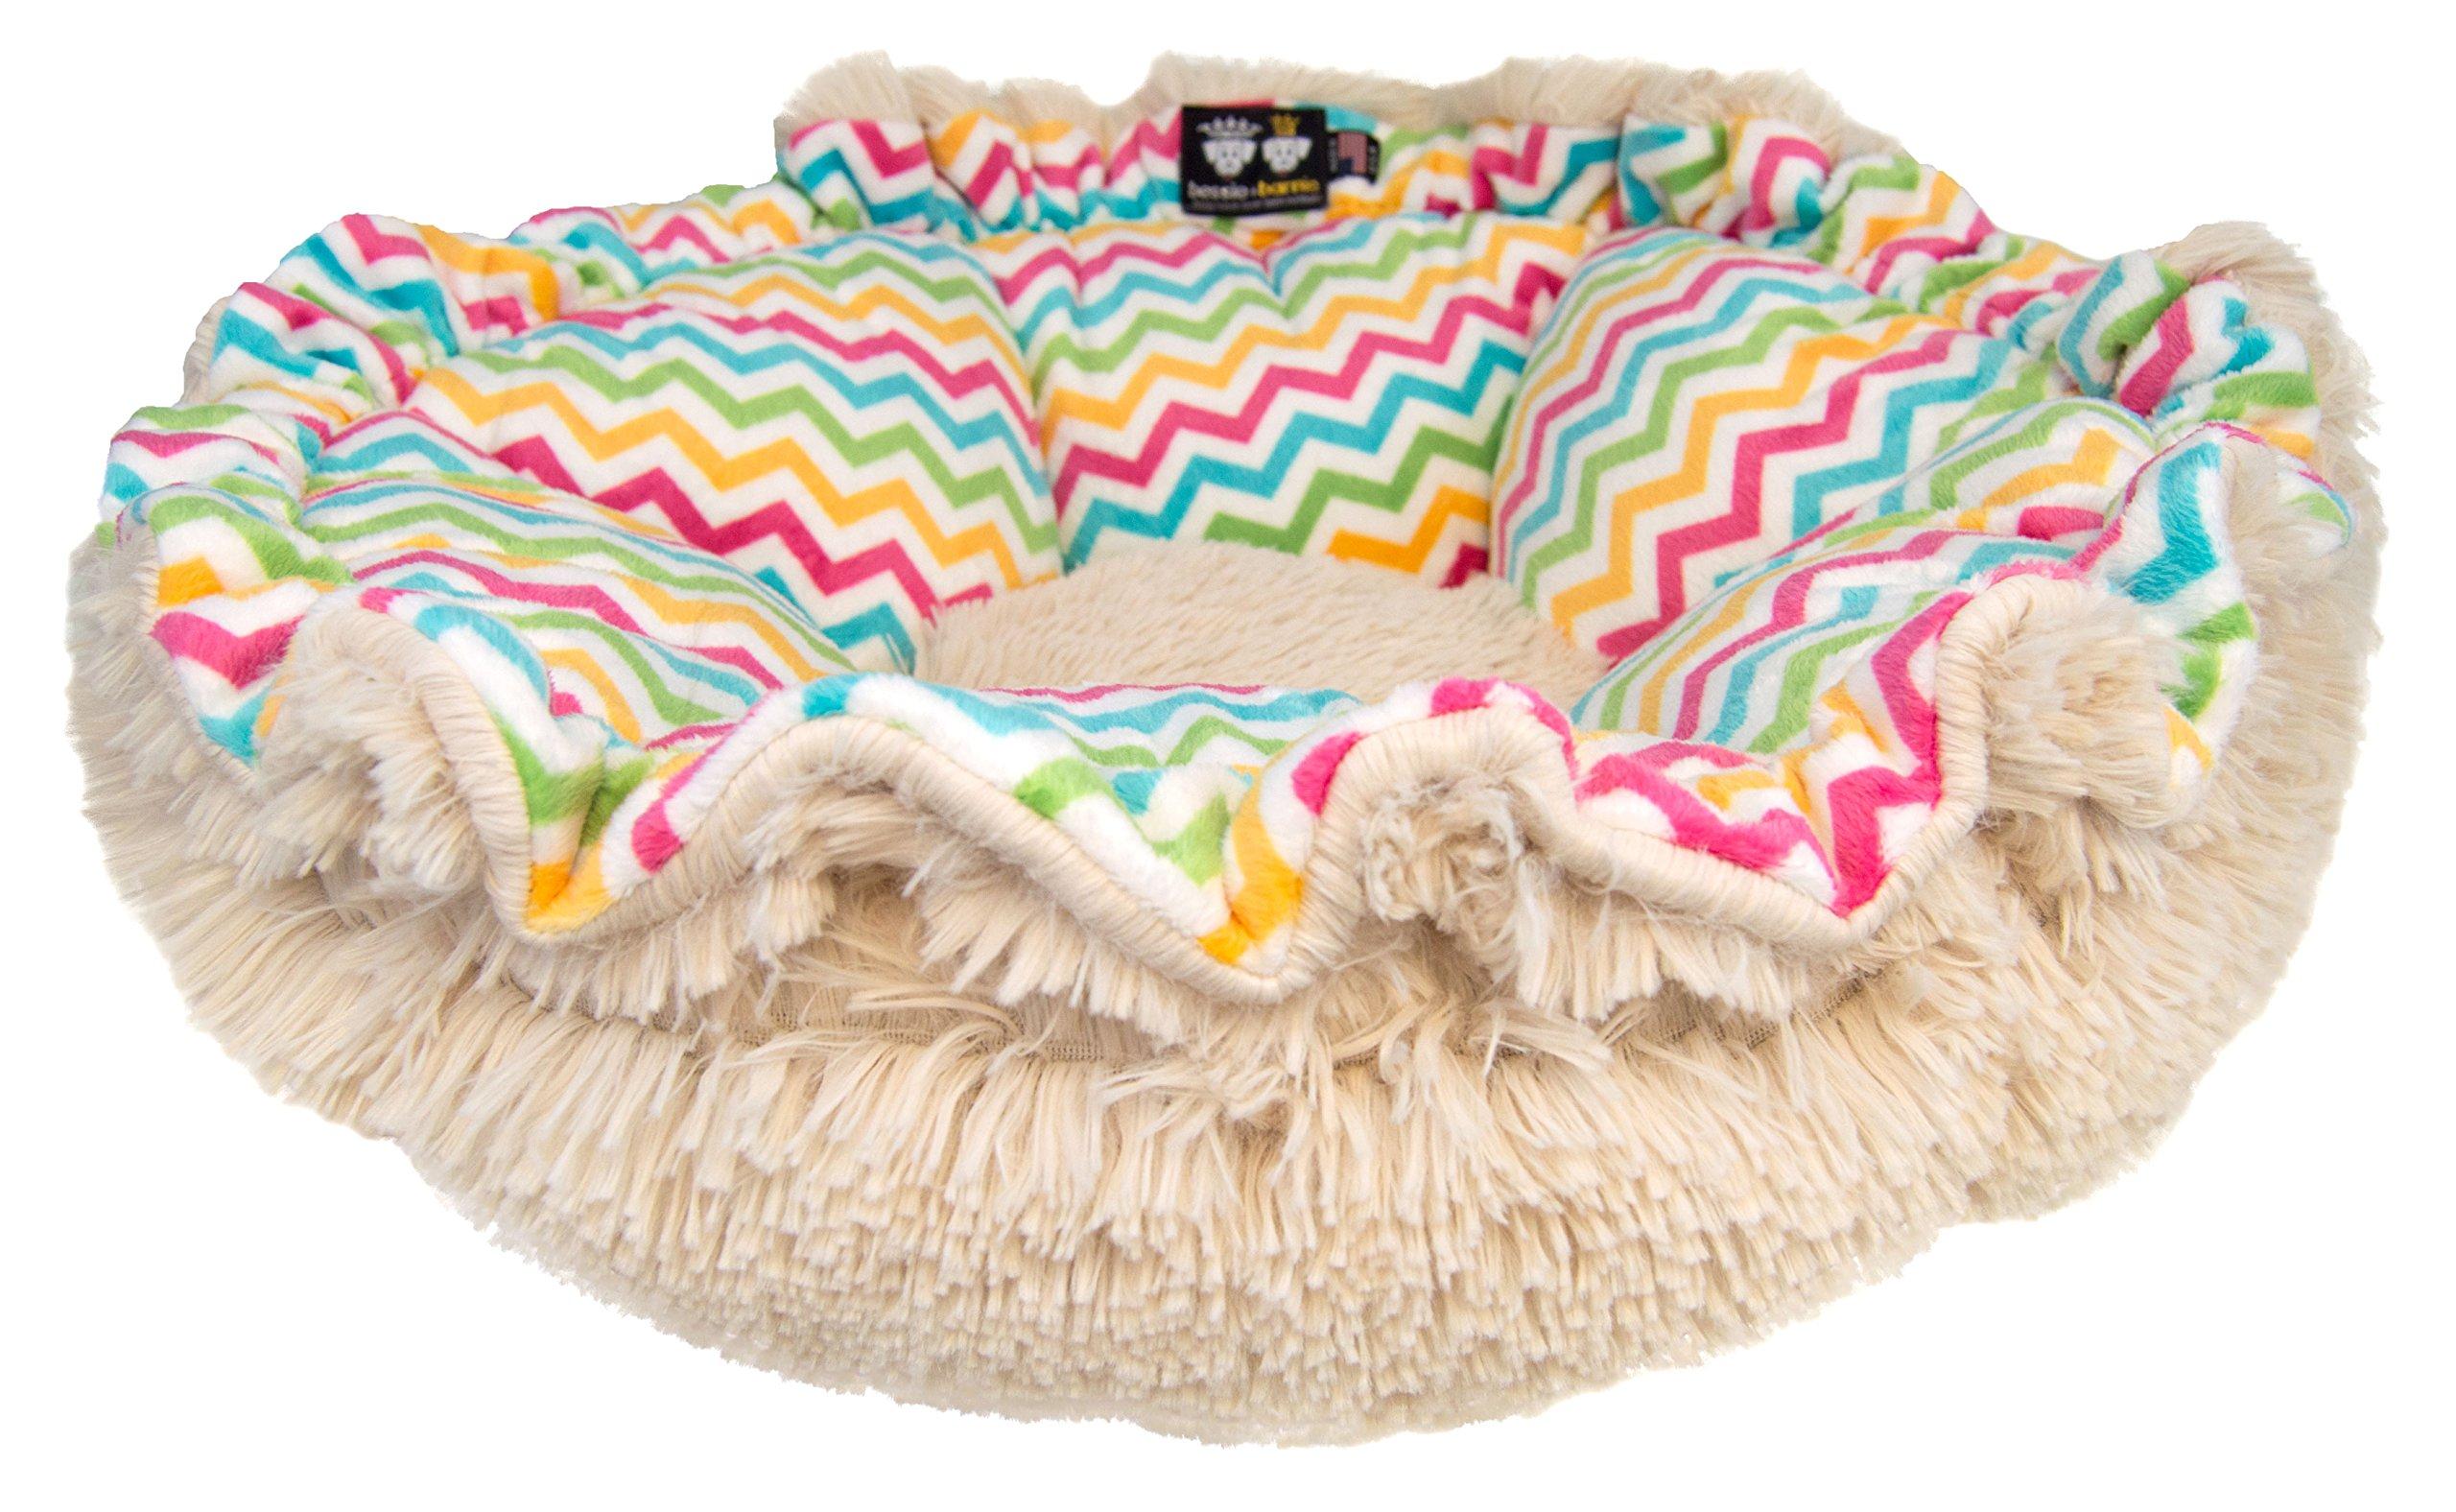 BESSIE AND BARNIE Ultra Plush Ocean Wave/Blondie Luxury Shag Deluxe Dog/Pet Cuddle Pod Bed by BESSIE AND BARNIE